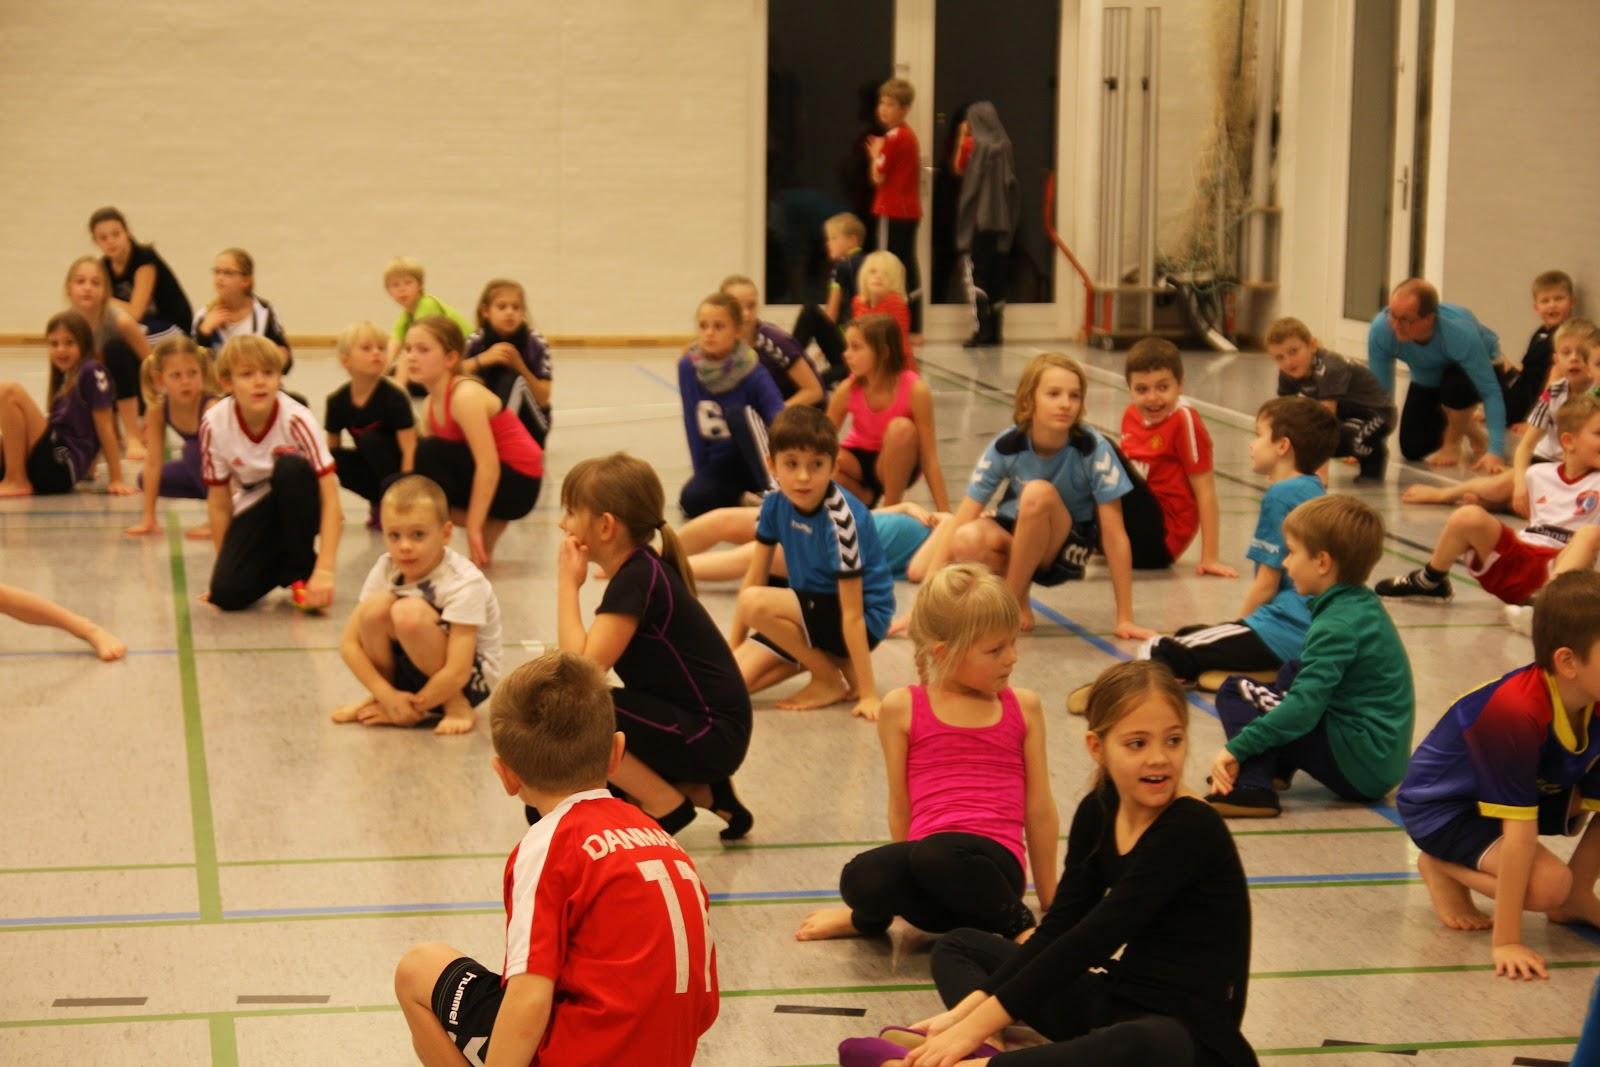 Gymnastikovernatning - januar 2015